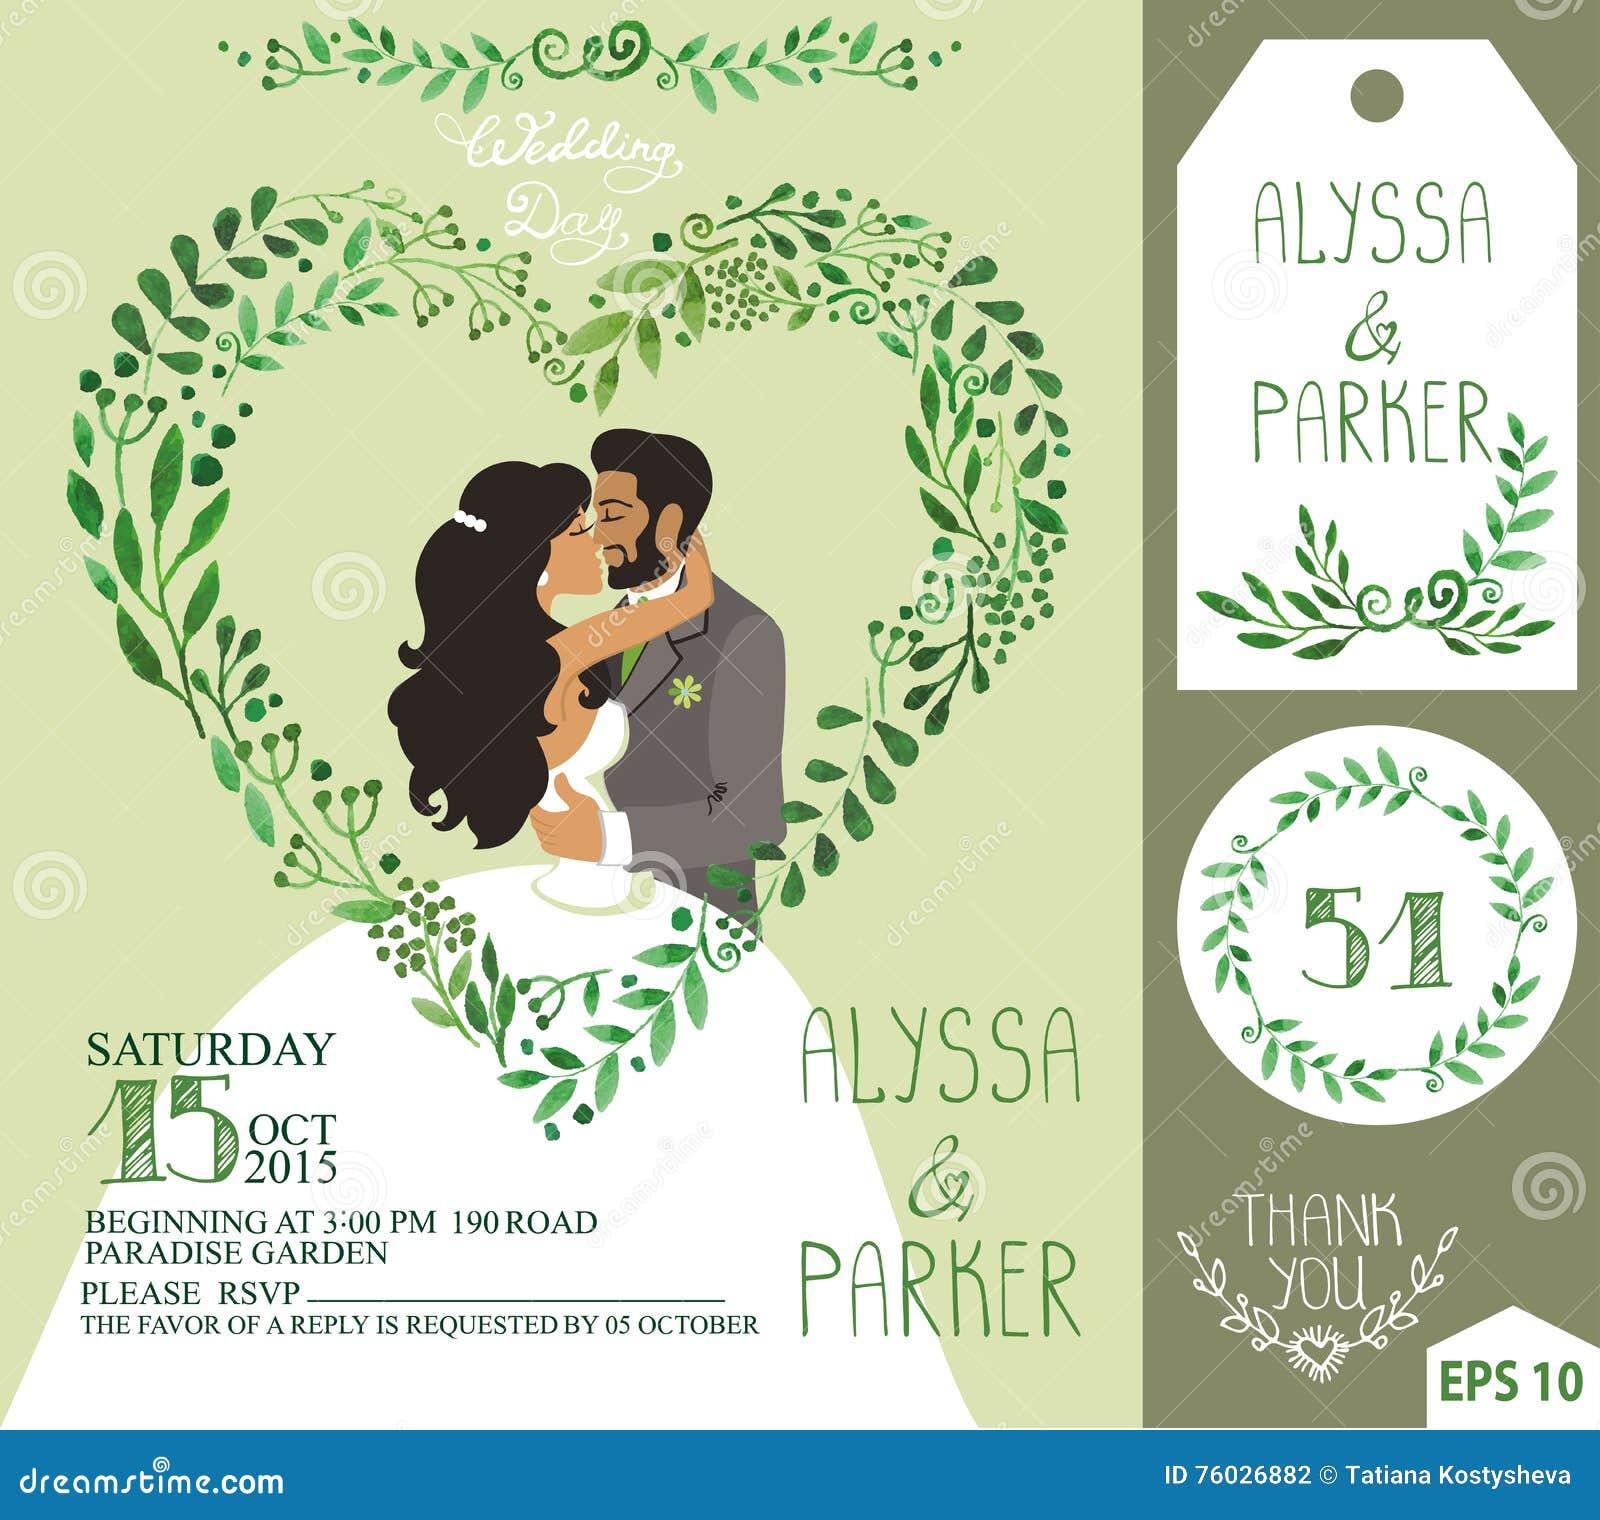 Wedding Invitation Green Branches Heart Kissing Bride Groom Stock